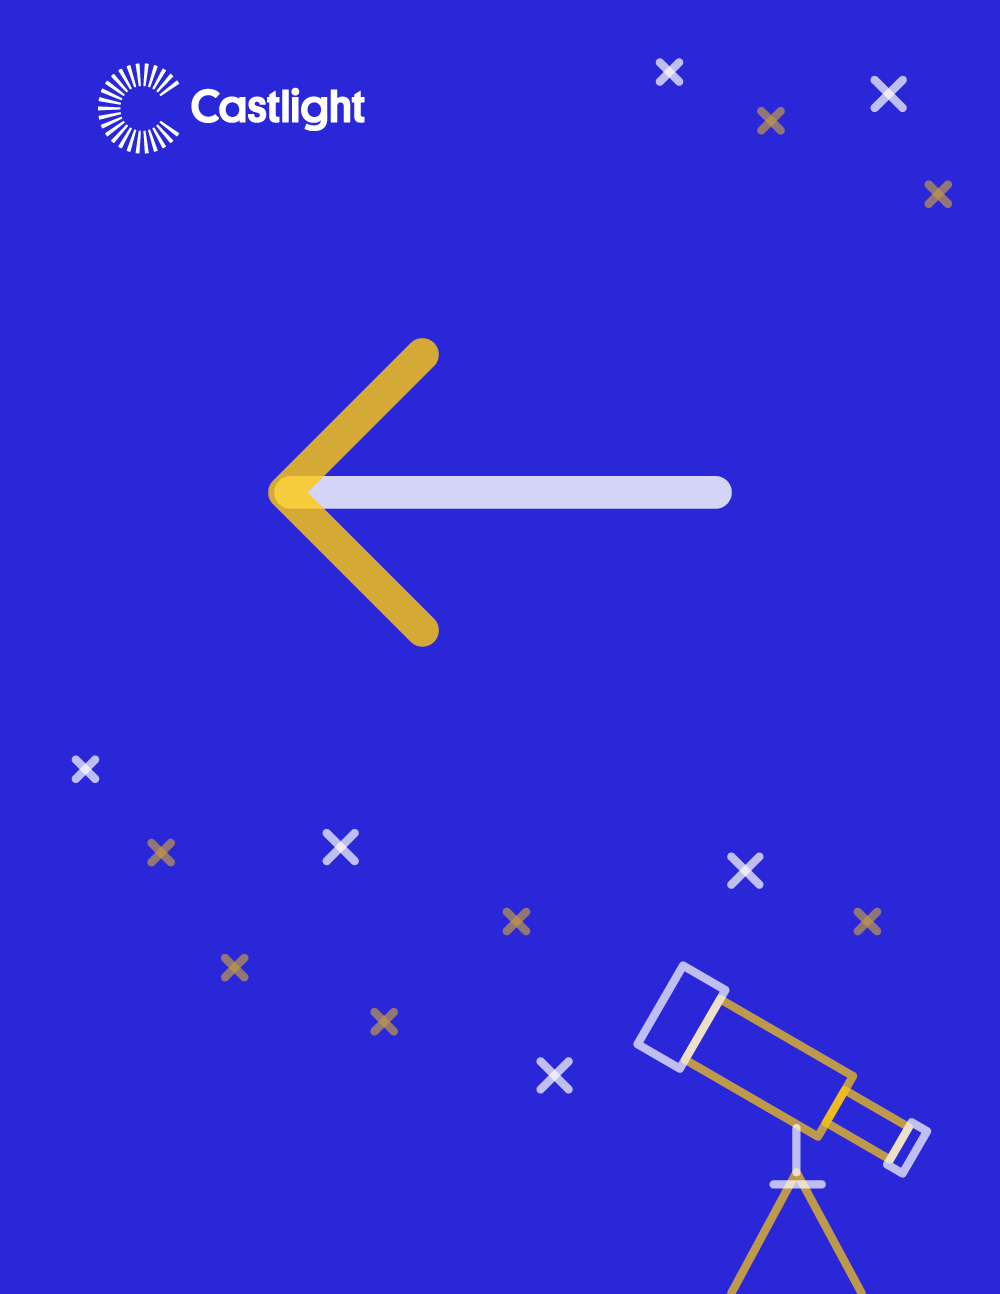 Directional-signage2